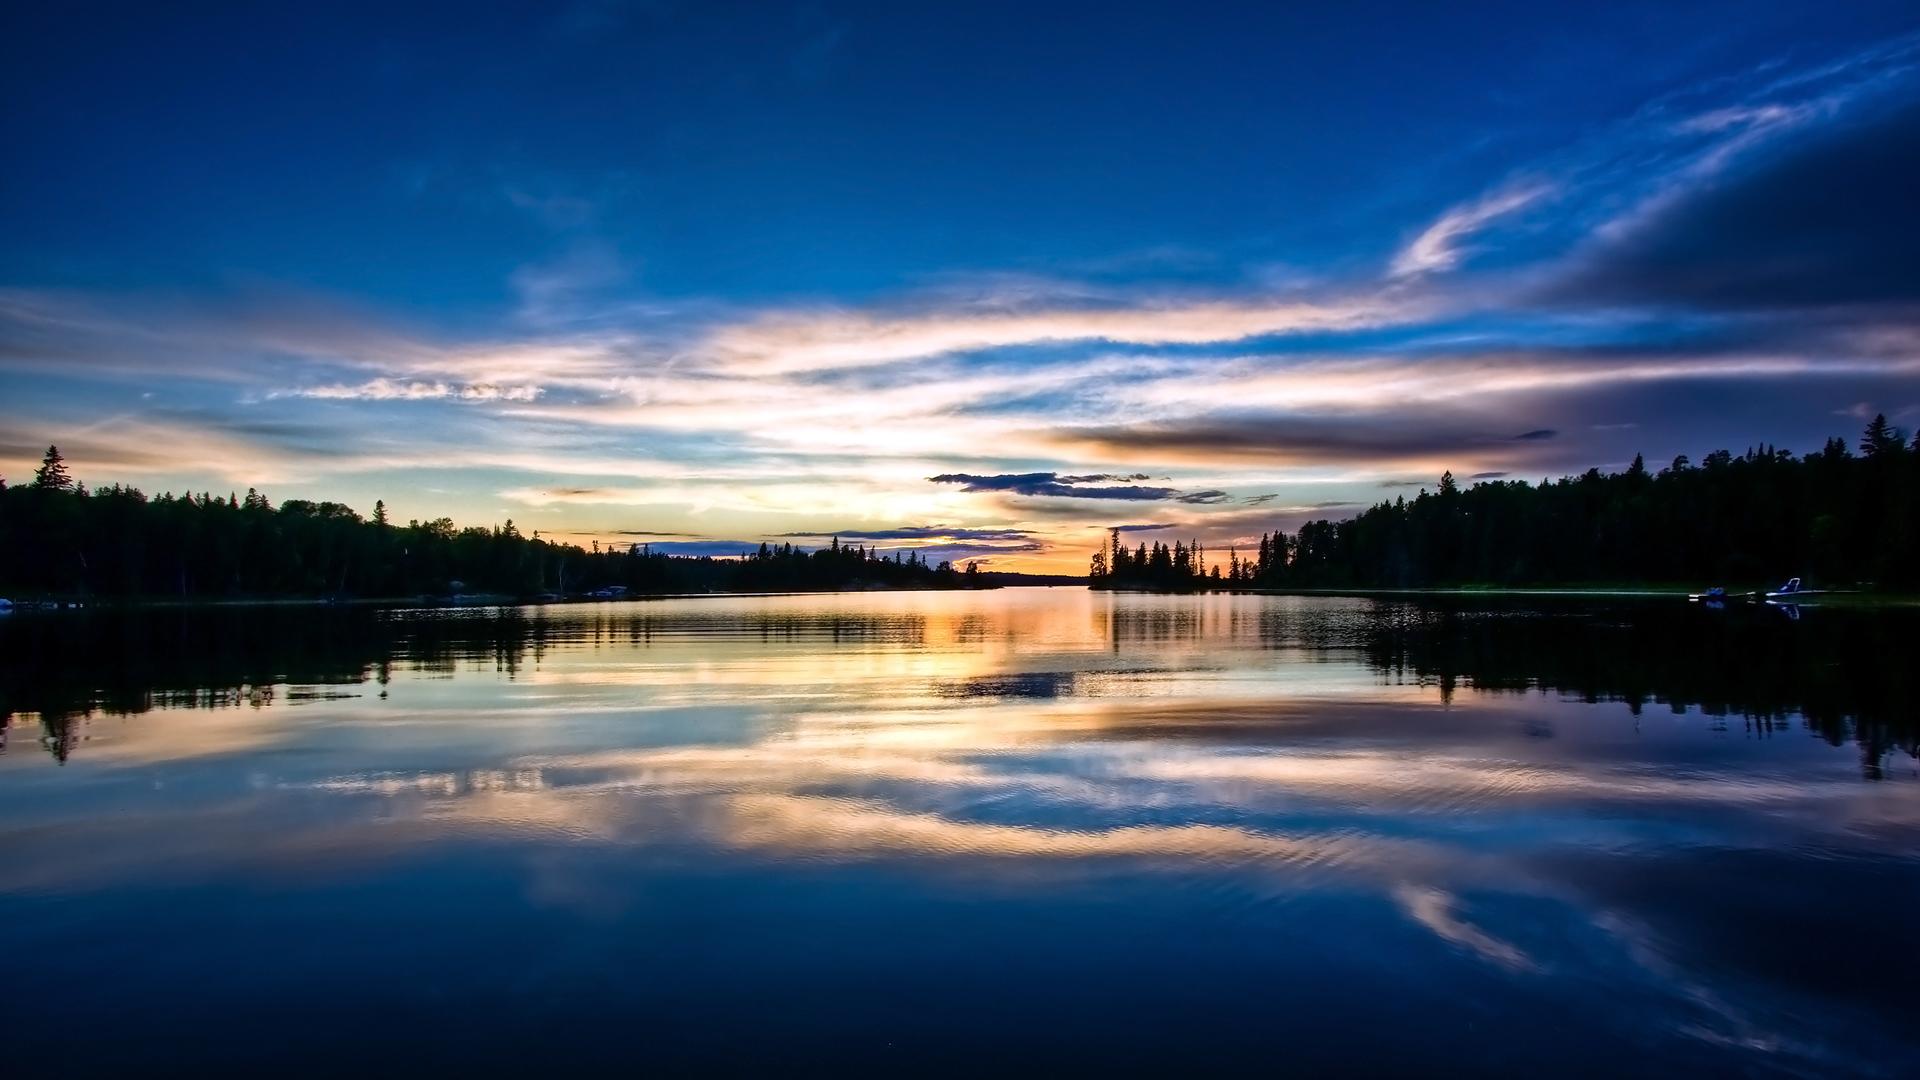 Sonnenuntergang Full HD Wallpaper And Hintergrund